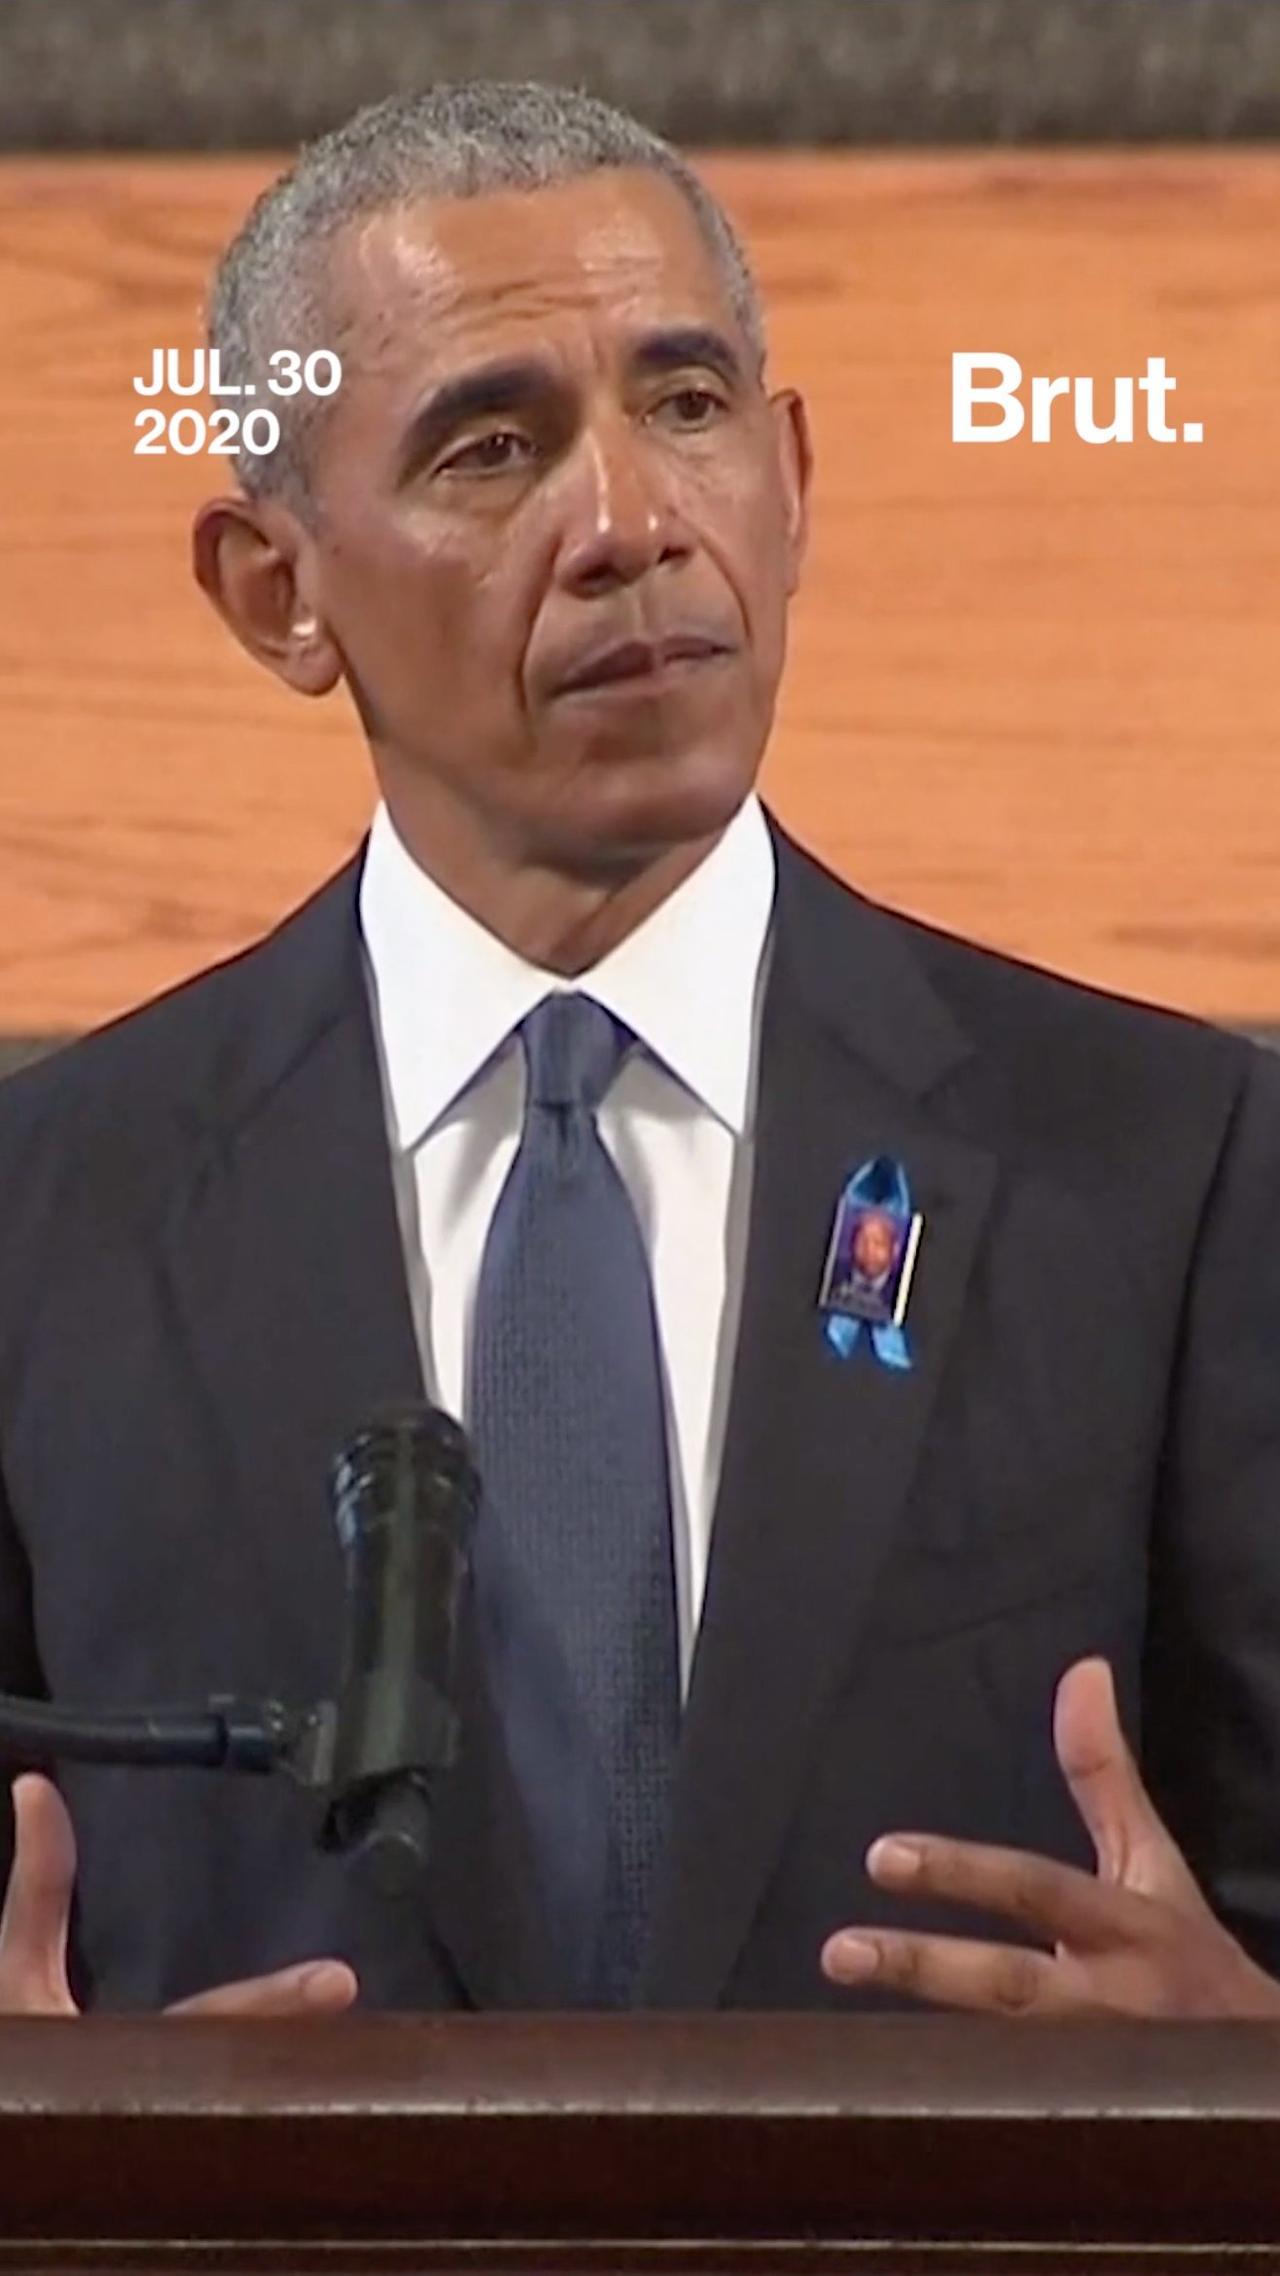 Barack Obama gives powerful eulogy at funeral for John Lewis